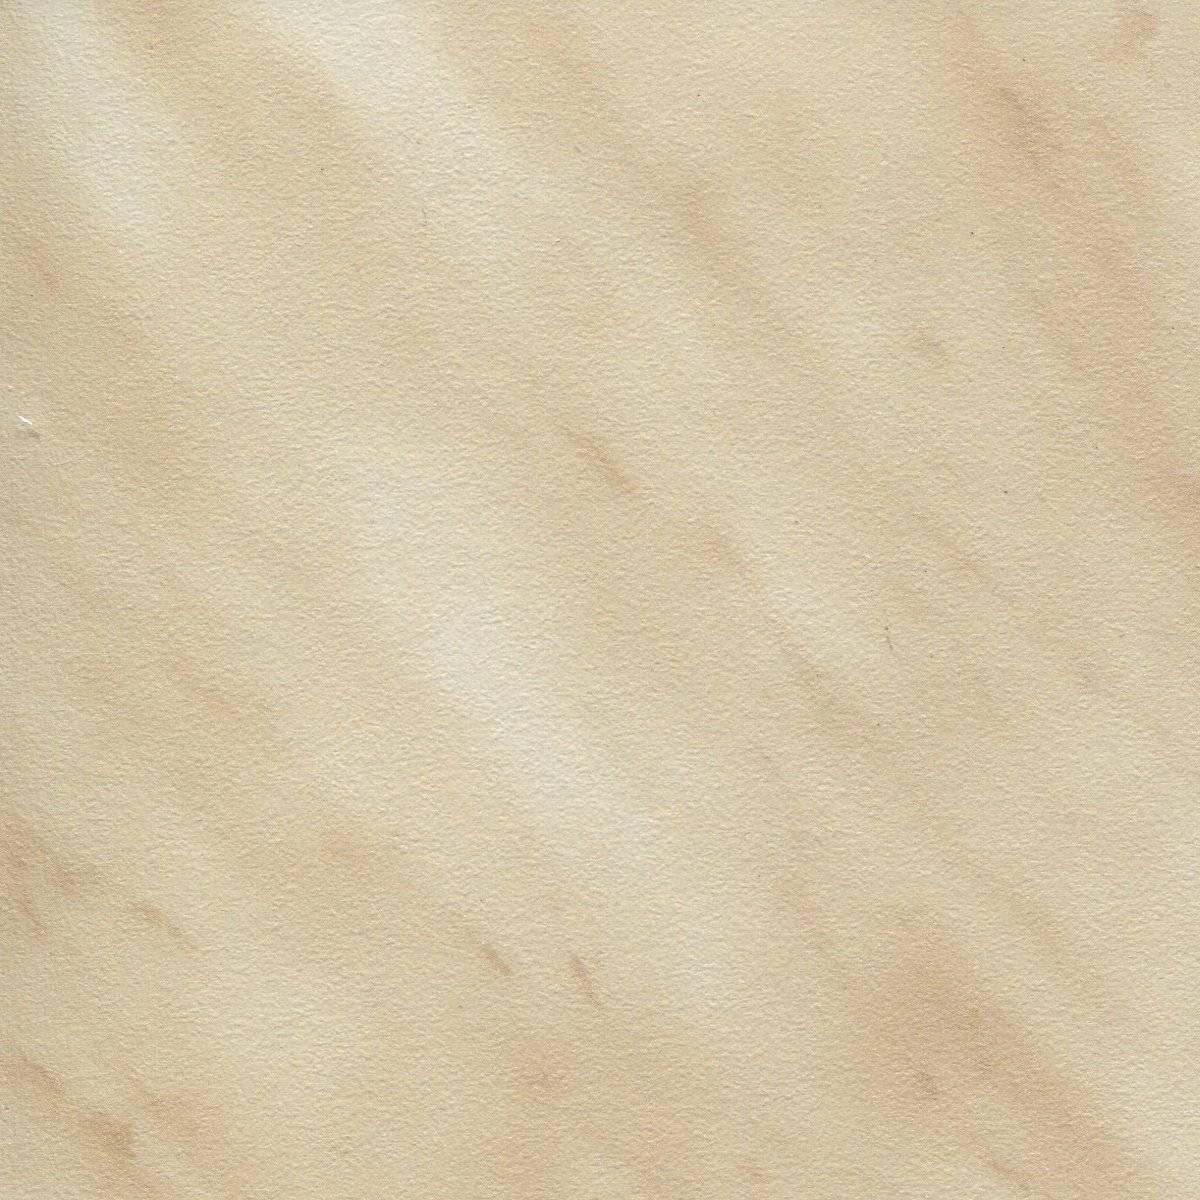 Оникс мрамор бежевый